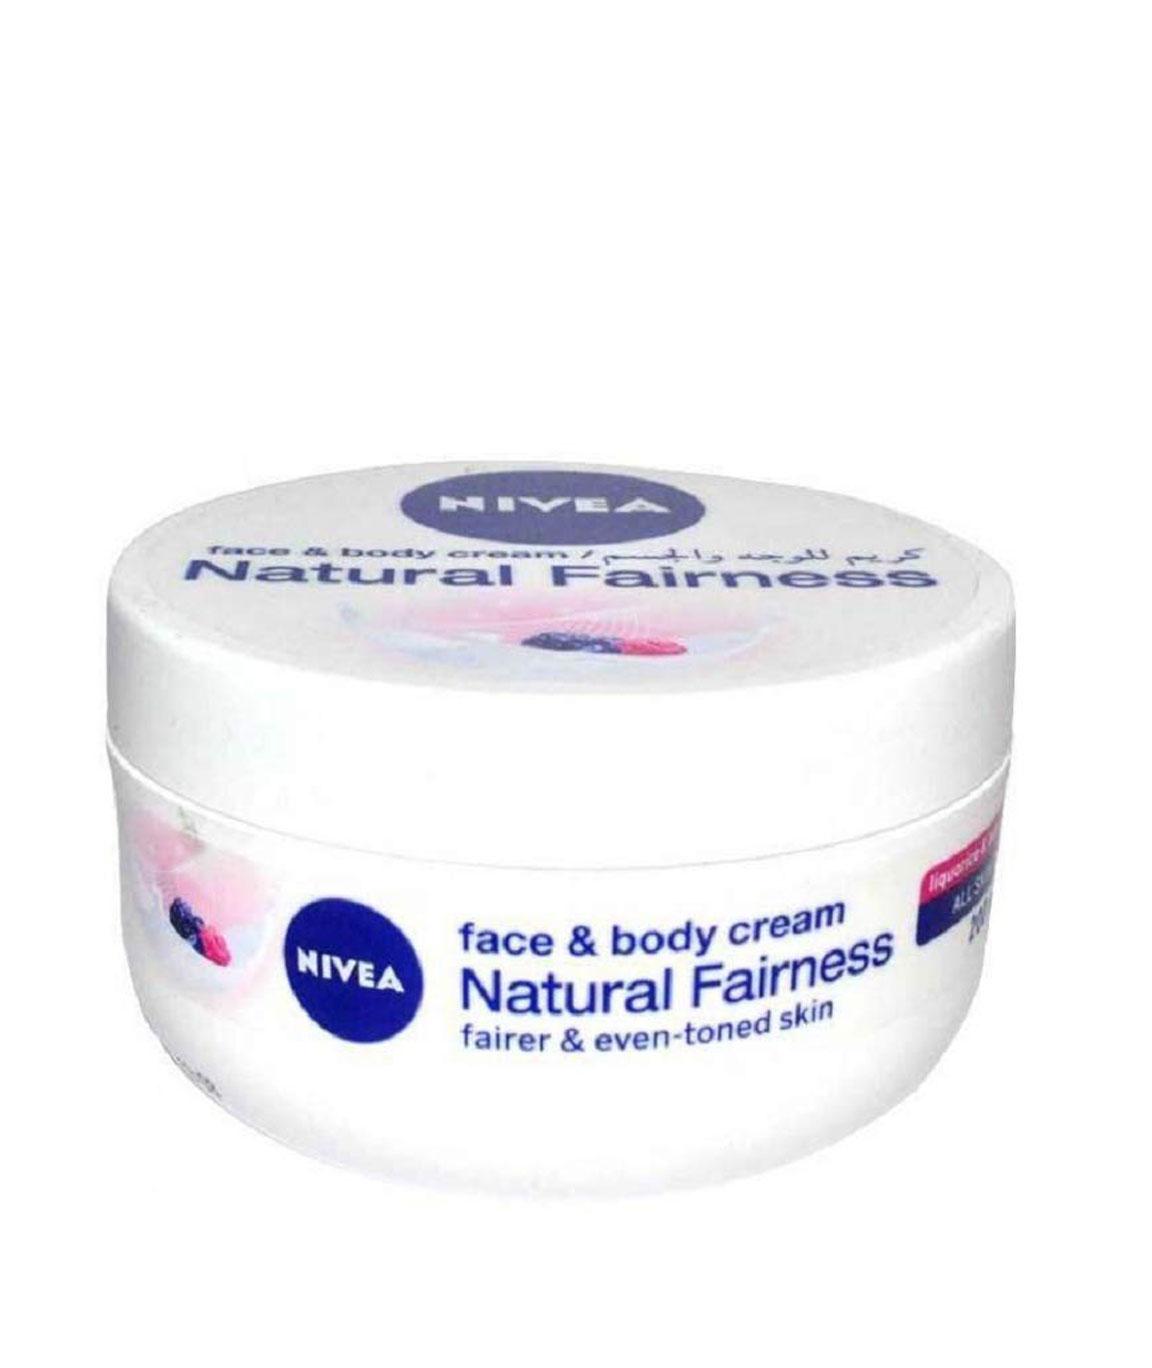 Nivea Natural Fairness Cream - 200ml - All type Skin (Imported) by Nivea